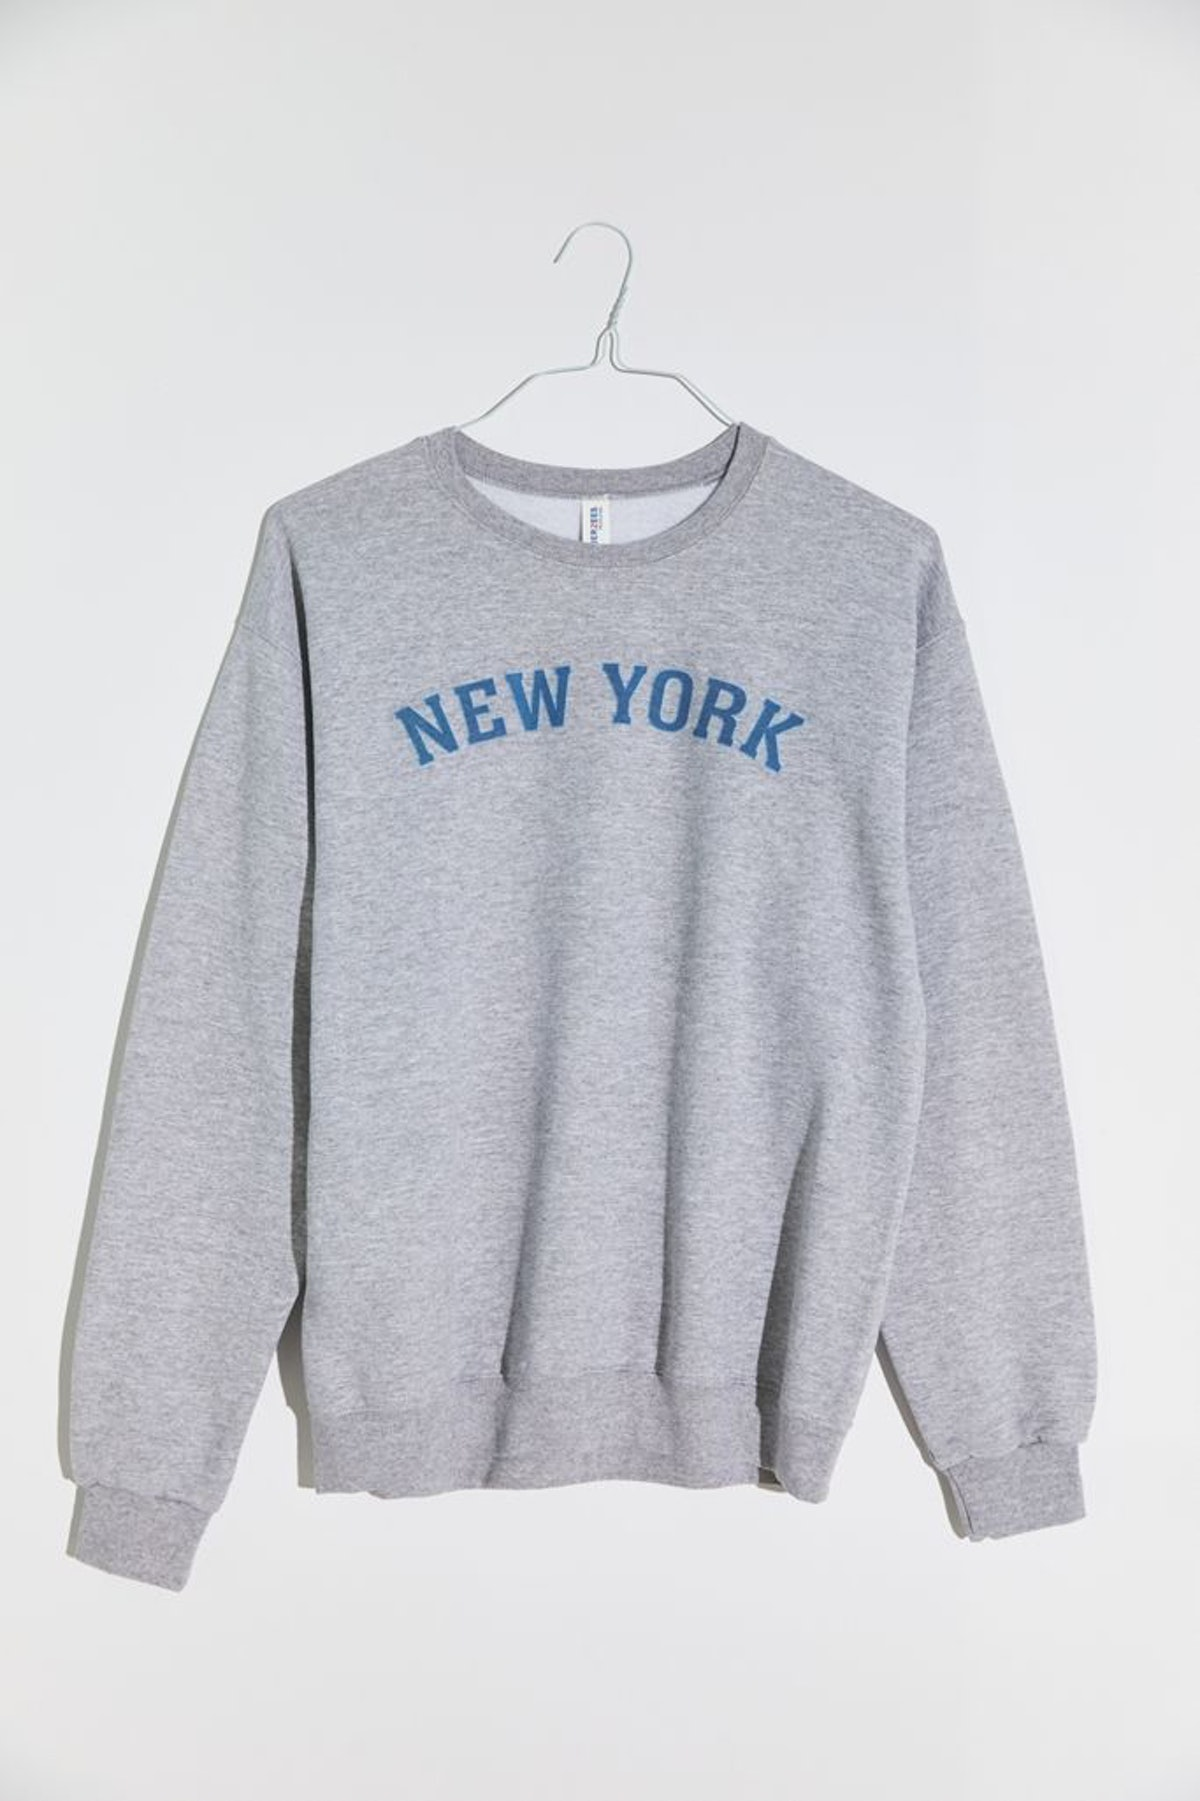 New York Fleece Crew Neck Sweatshirt